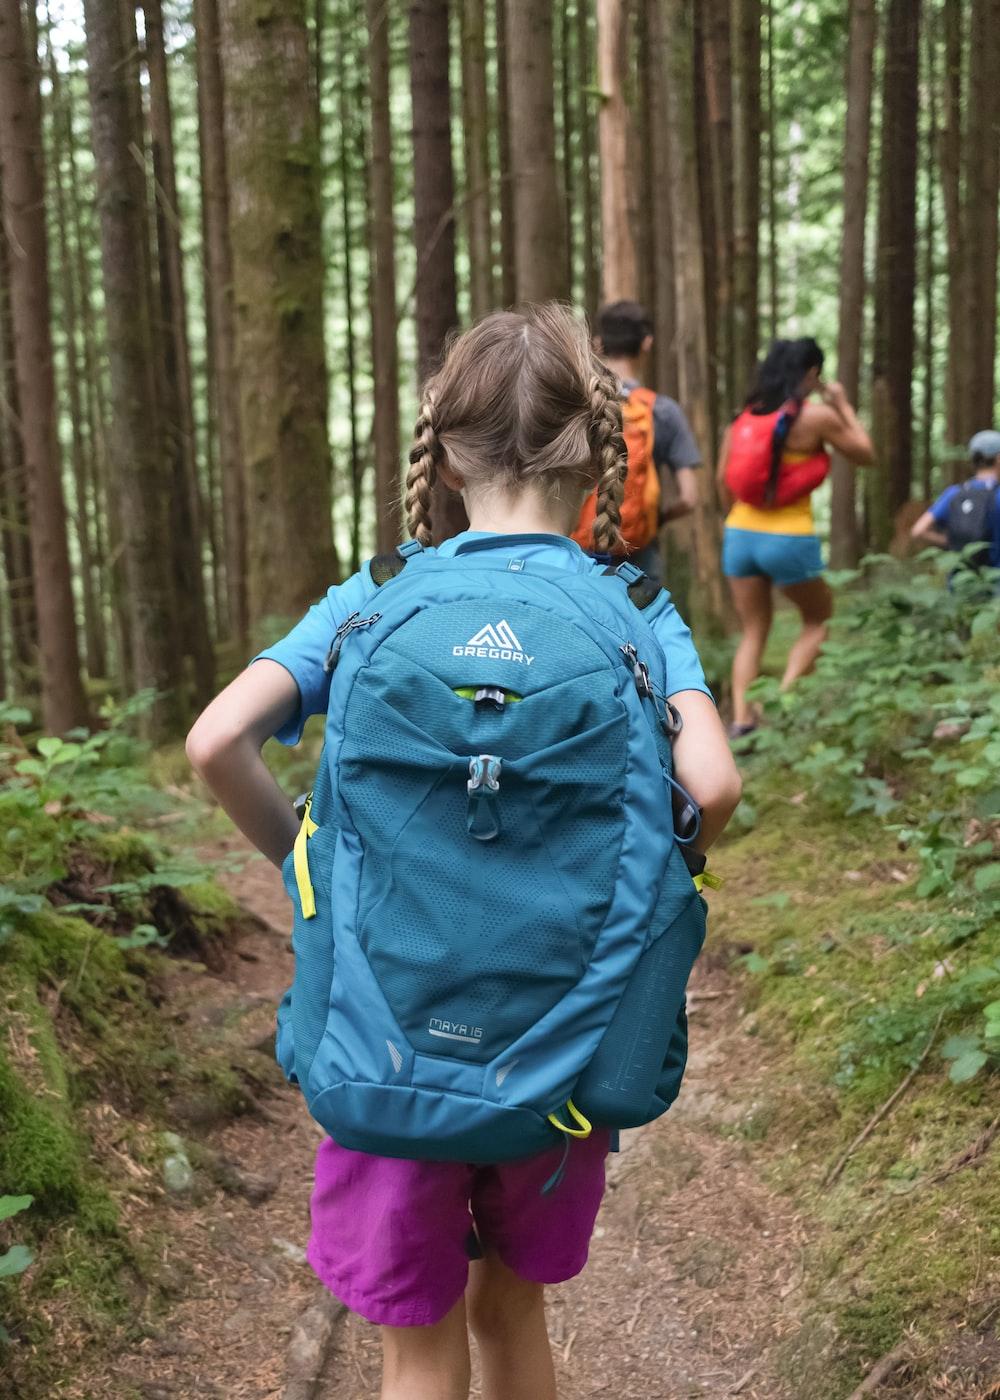 girl wearing blue backpack